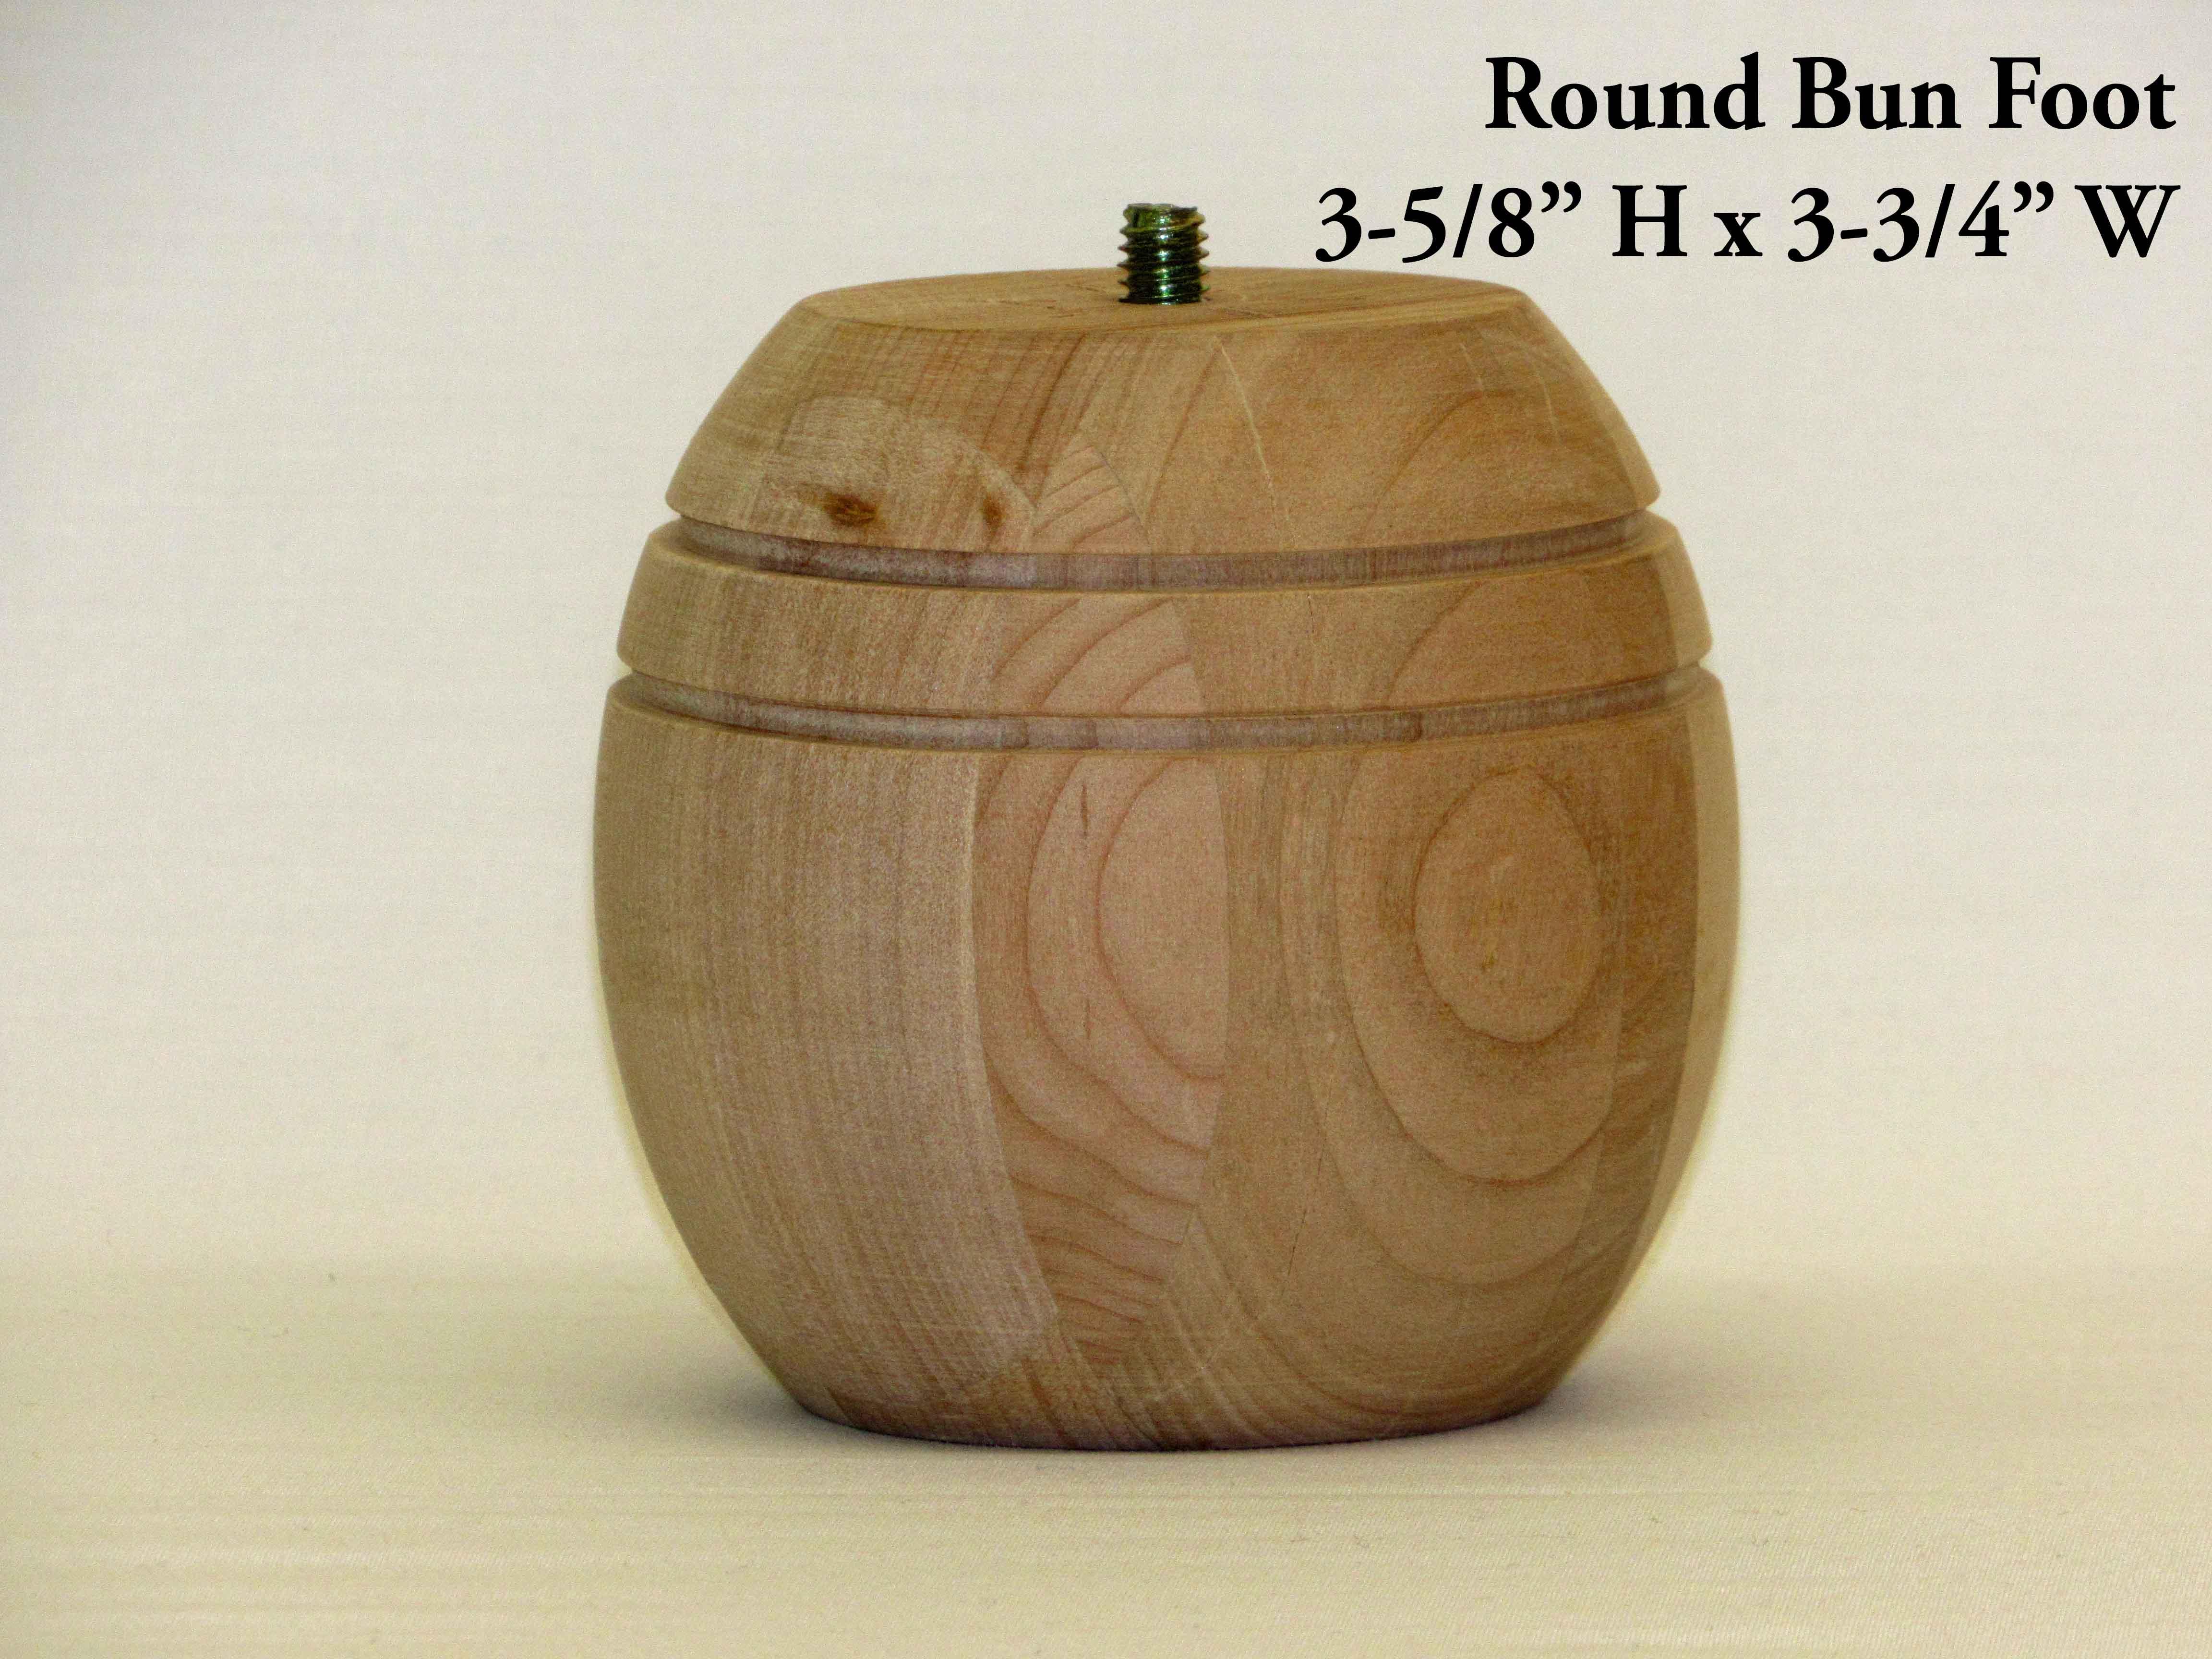 Round Bun Foot Pair Capitol City Lumber